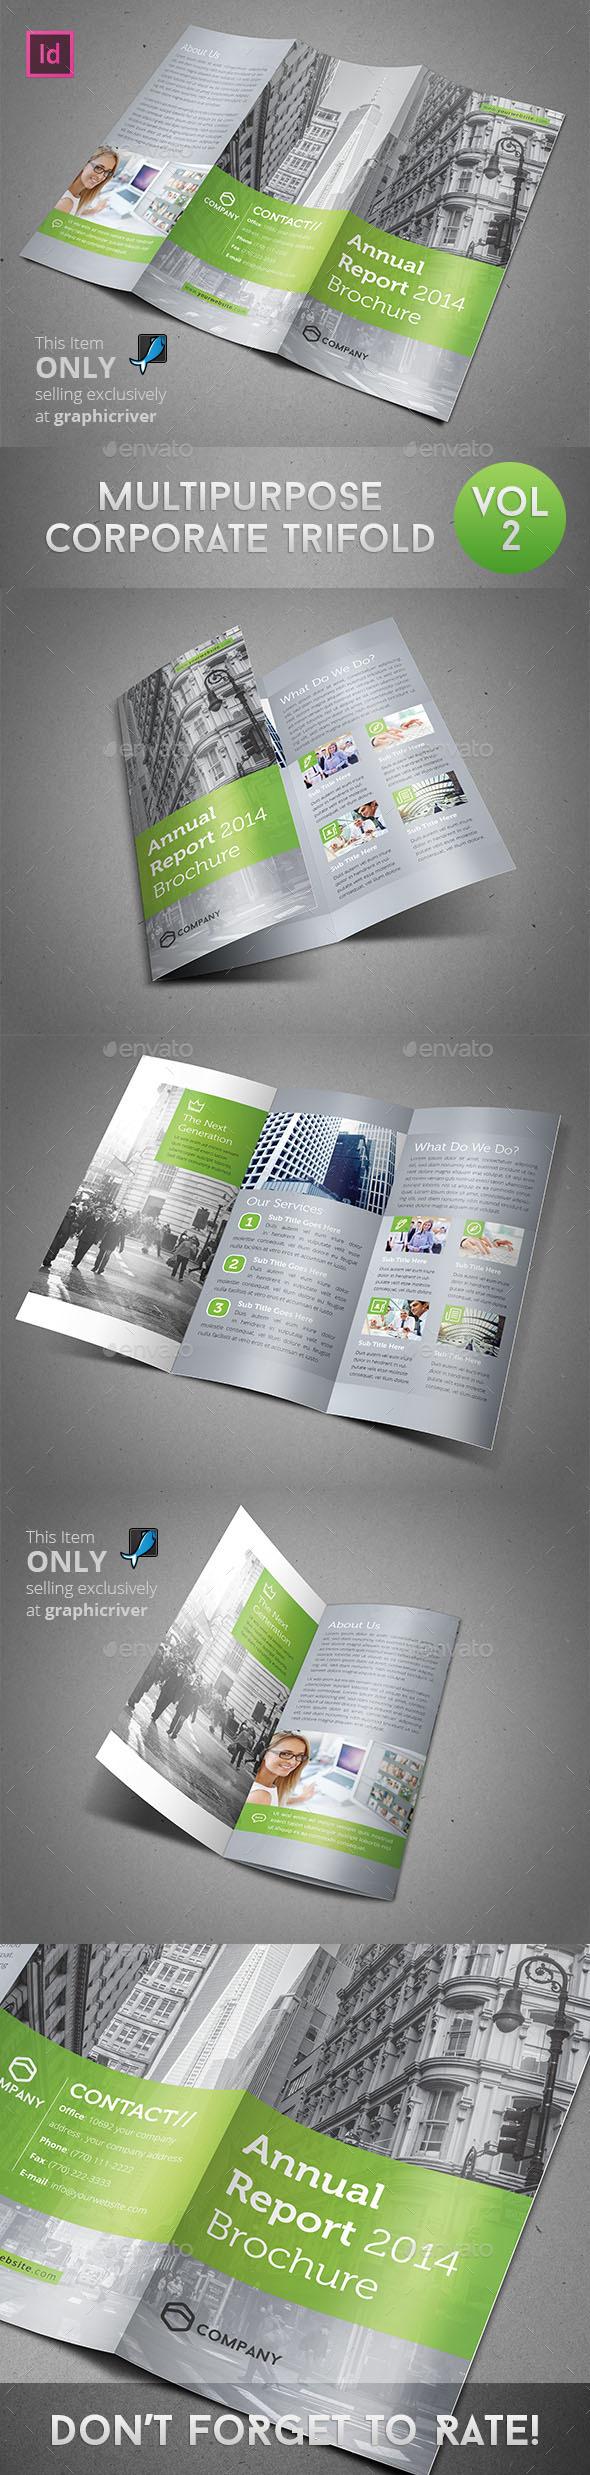 Multipurpose Corporate Trifold Vol 2 - Corporate Brochures